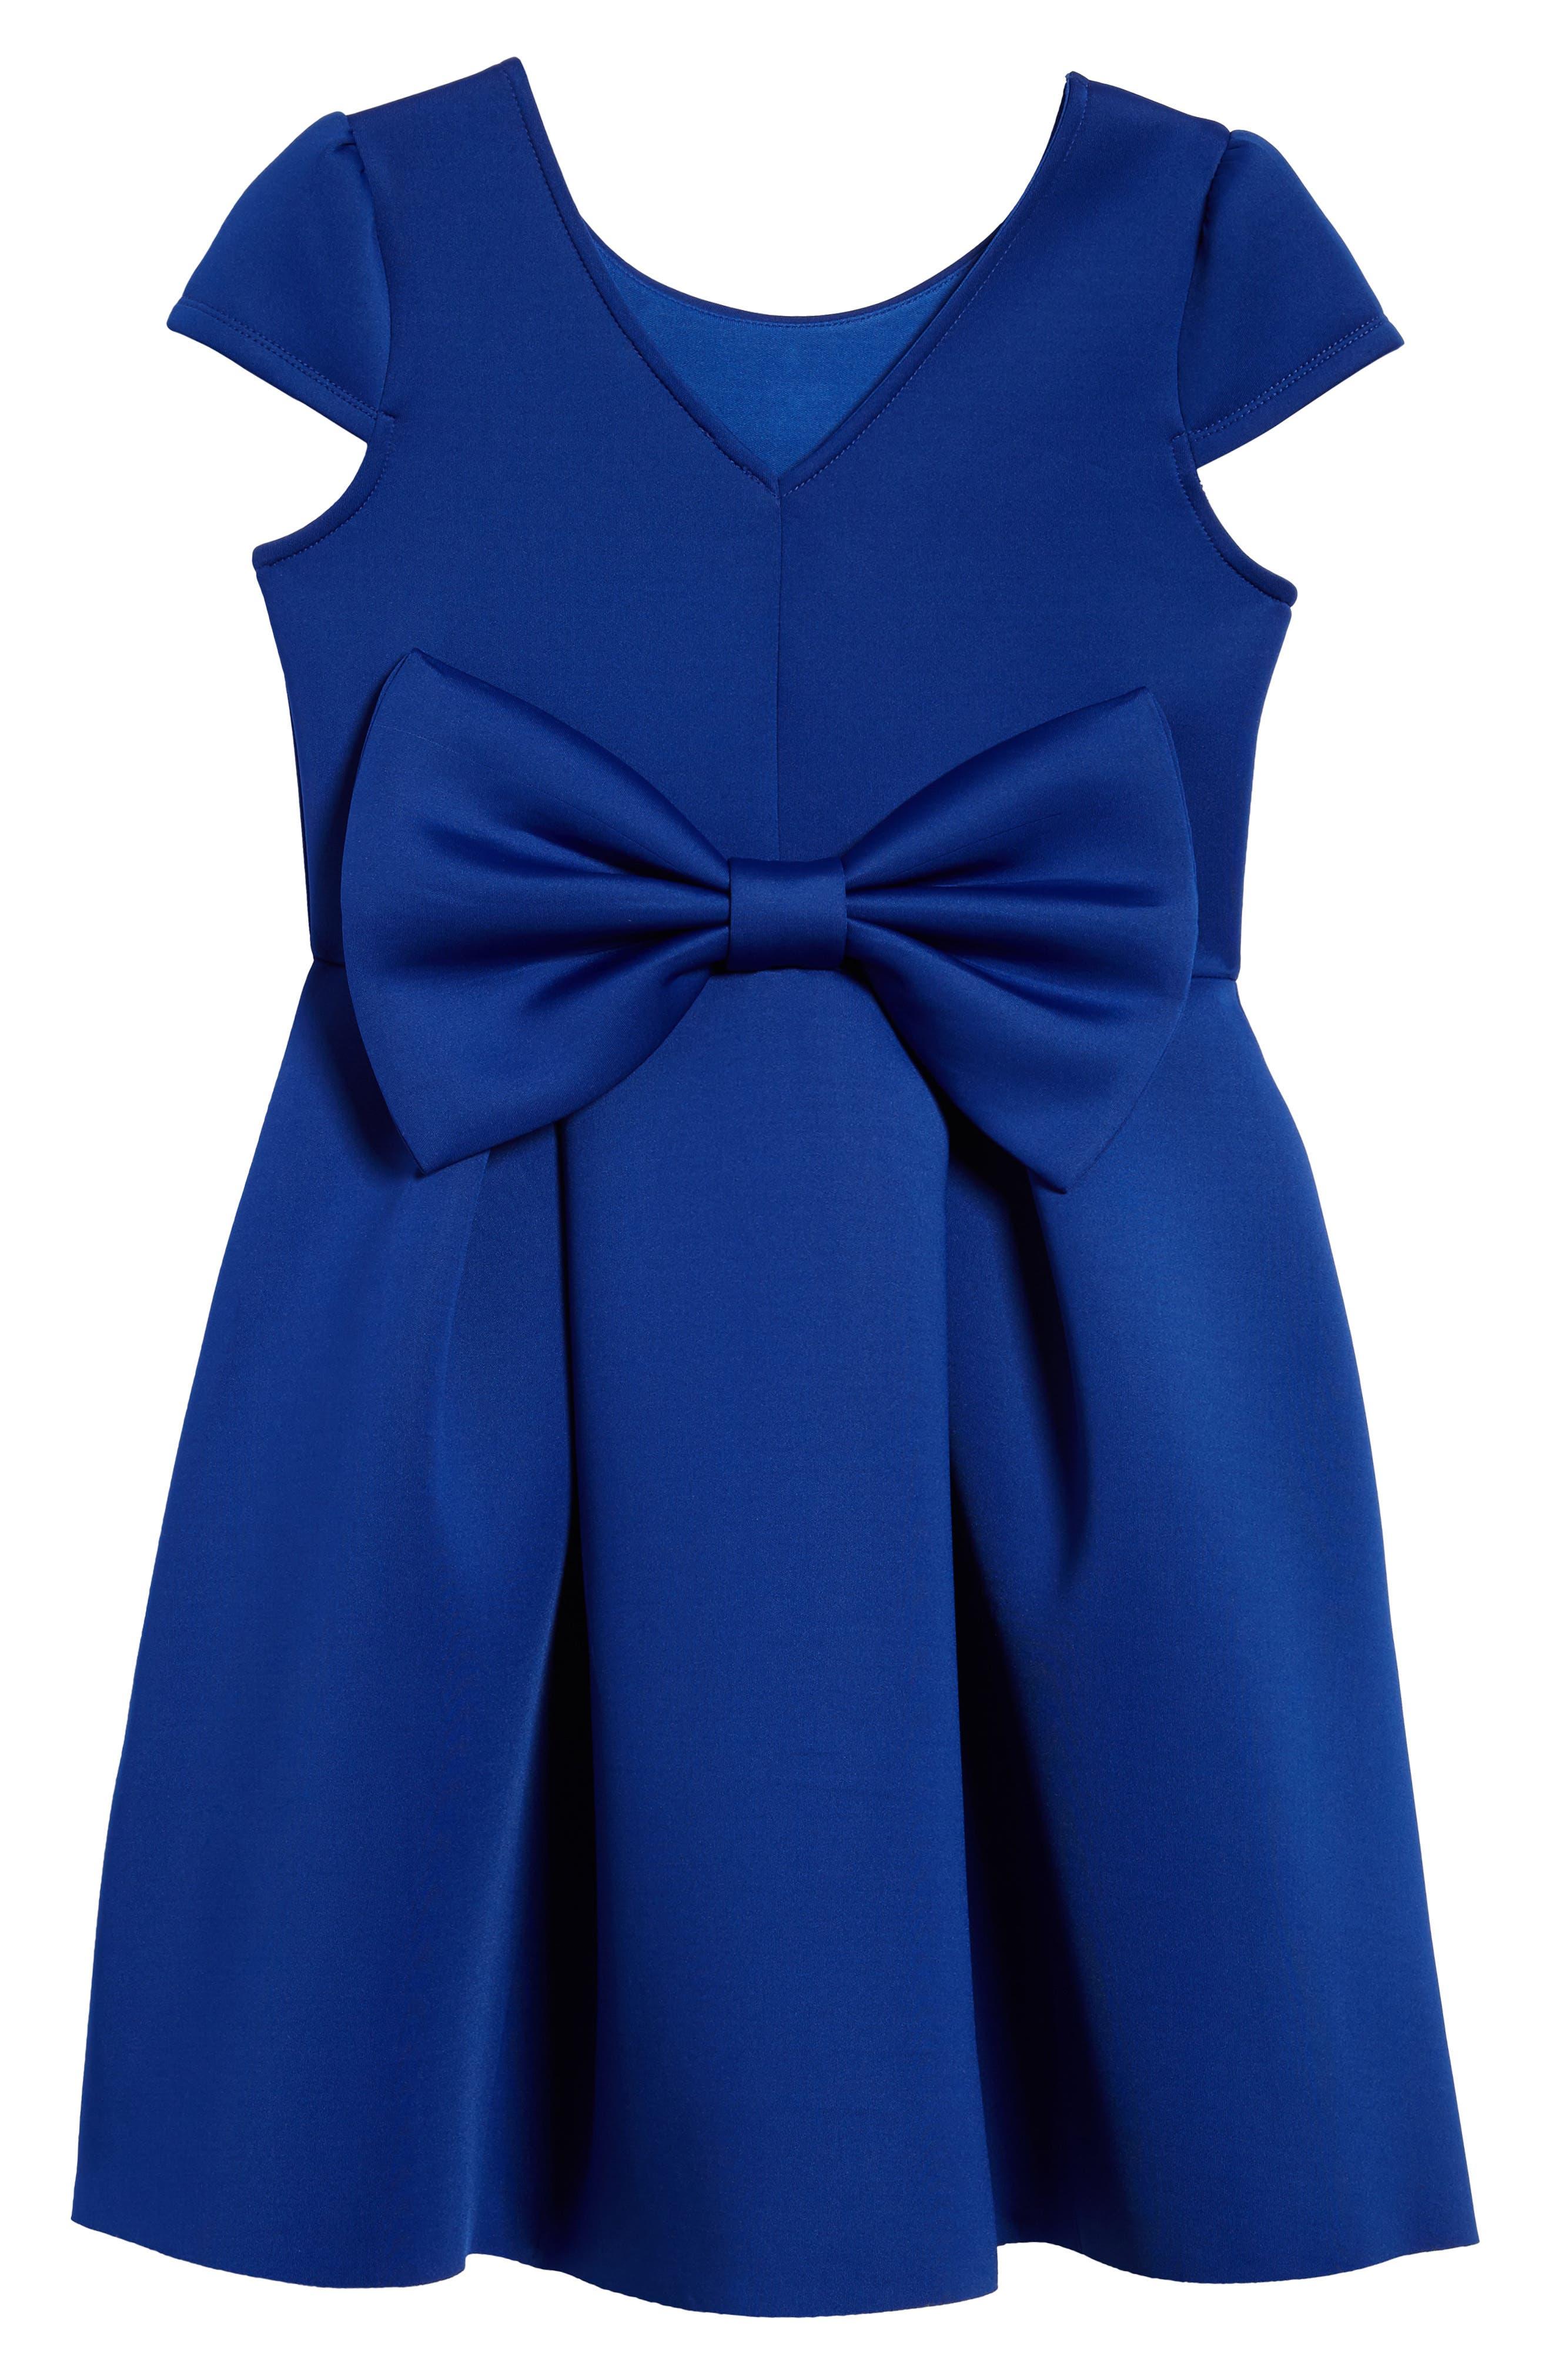 Embellished Scuba Dress,                             Alternate thumbnail 2, color,                             421